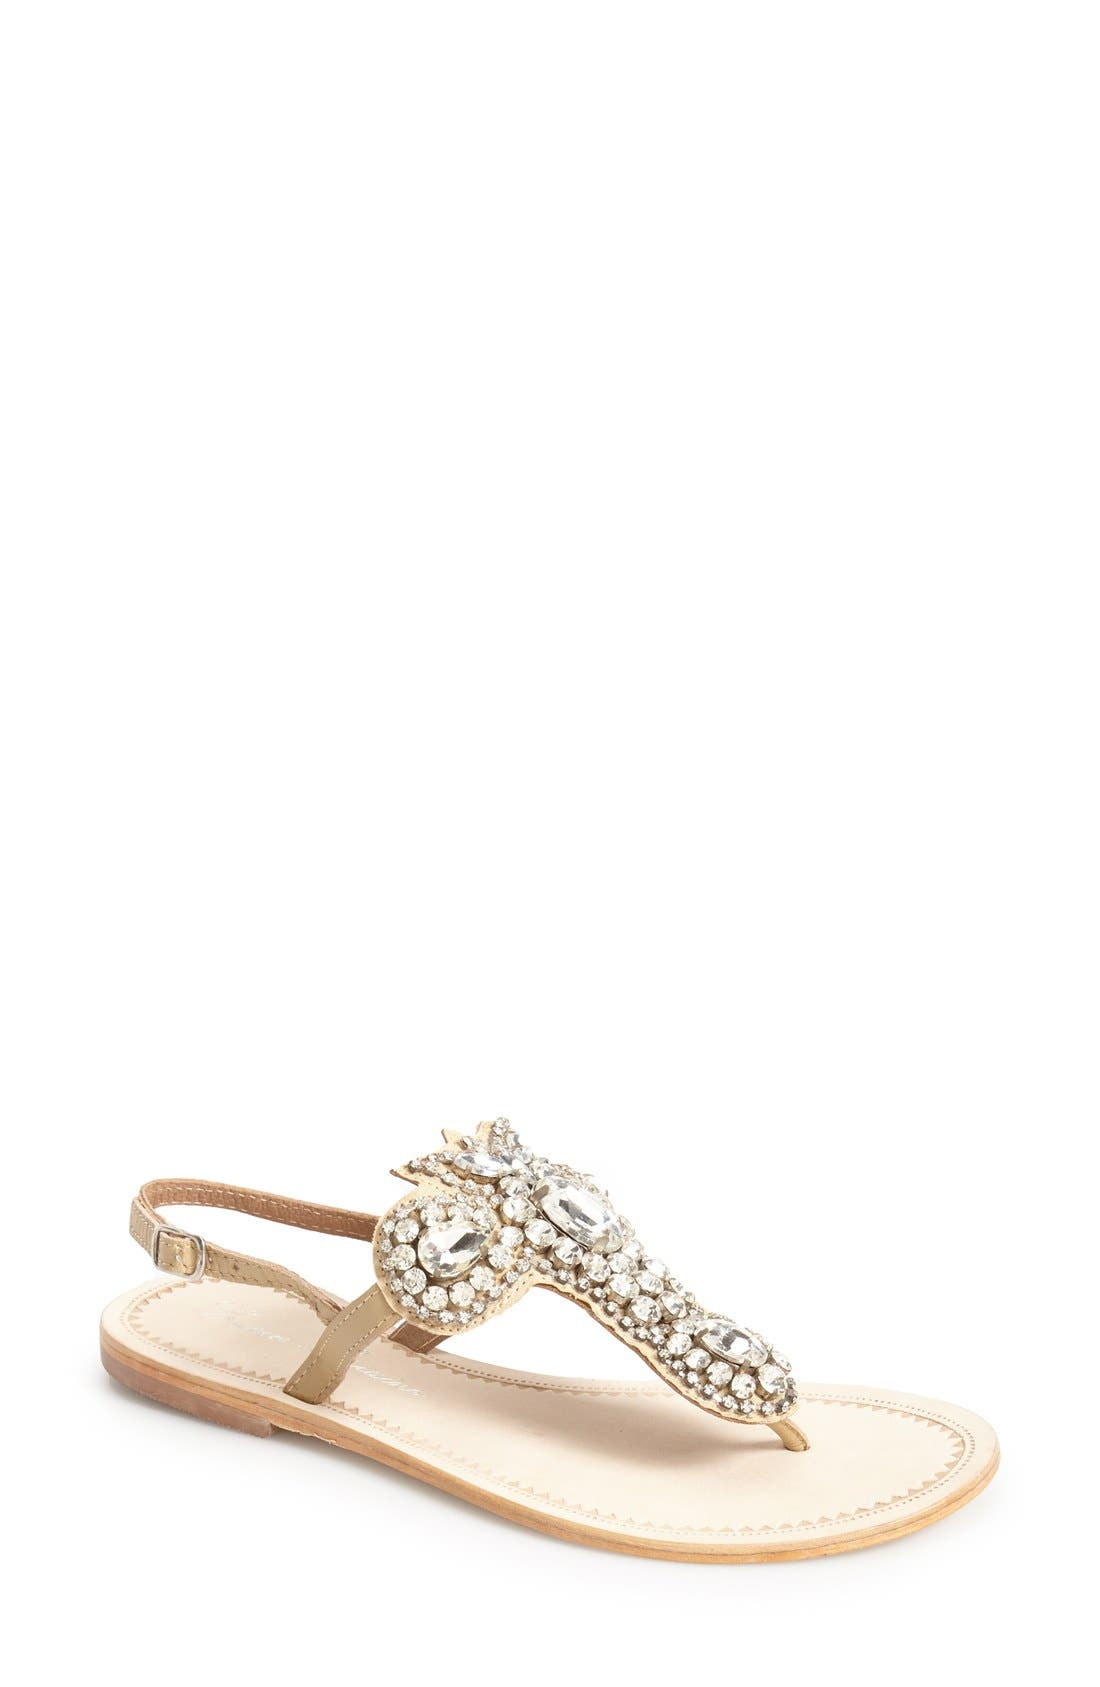 Alternate Image 1 Selected - Lauren Lorraine 'Ibiza' Crystal Thong Sandal (Women)